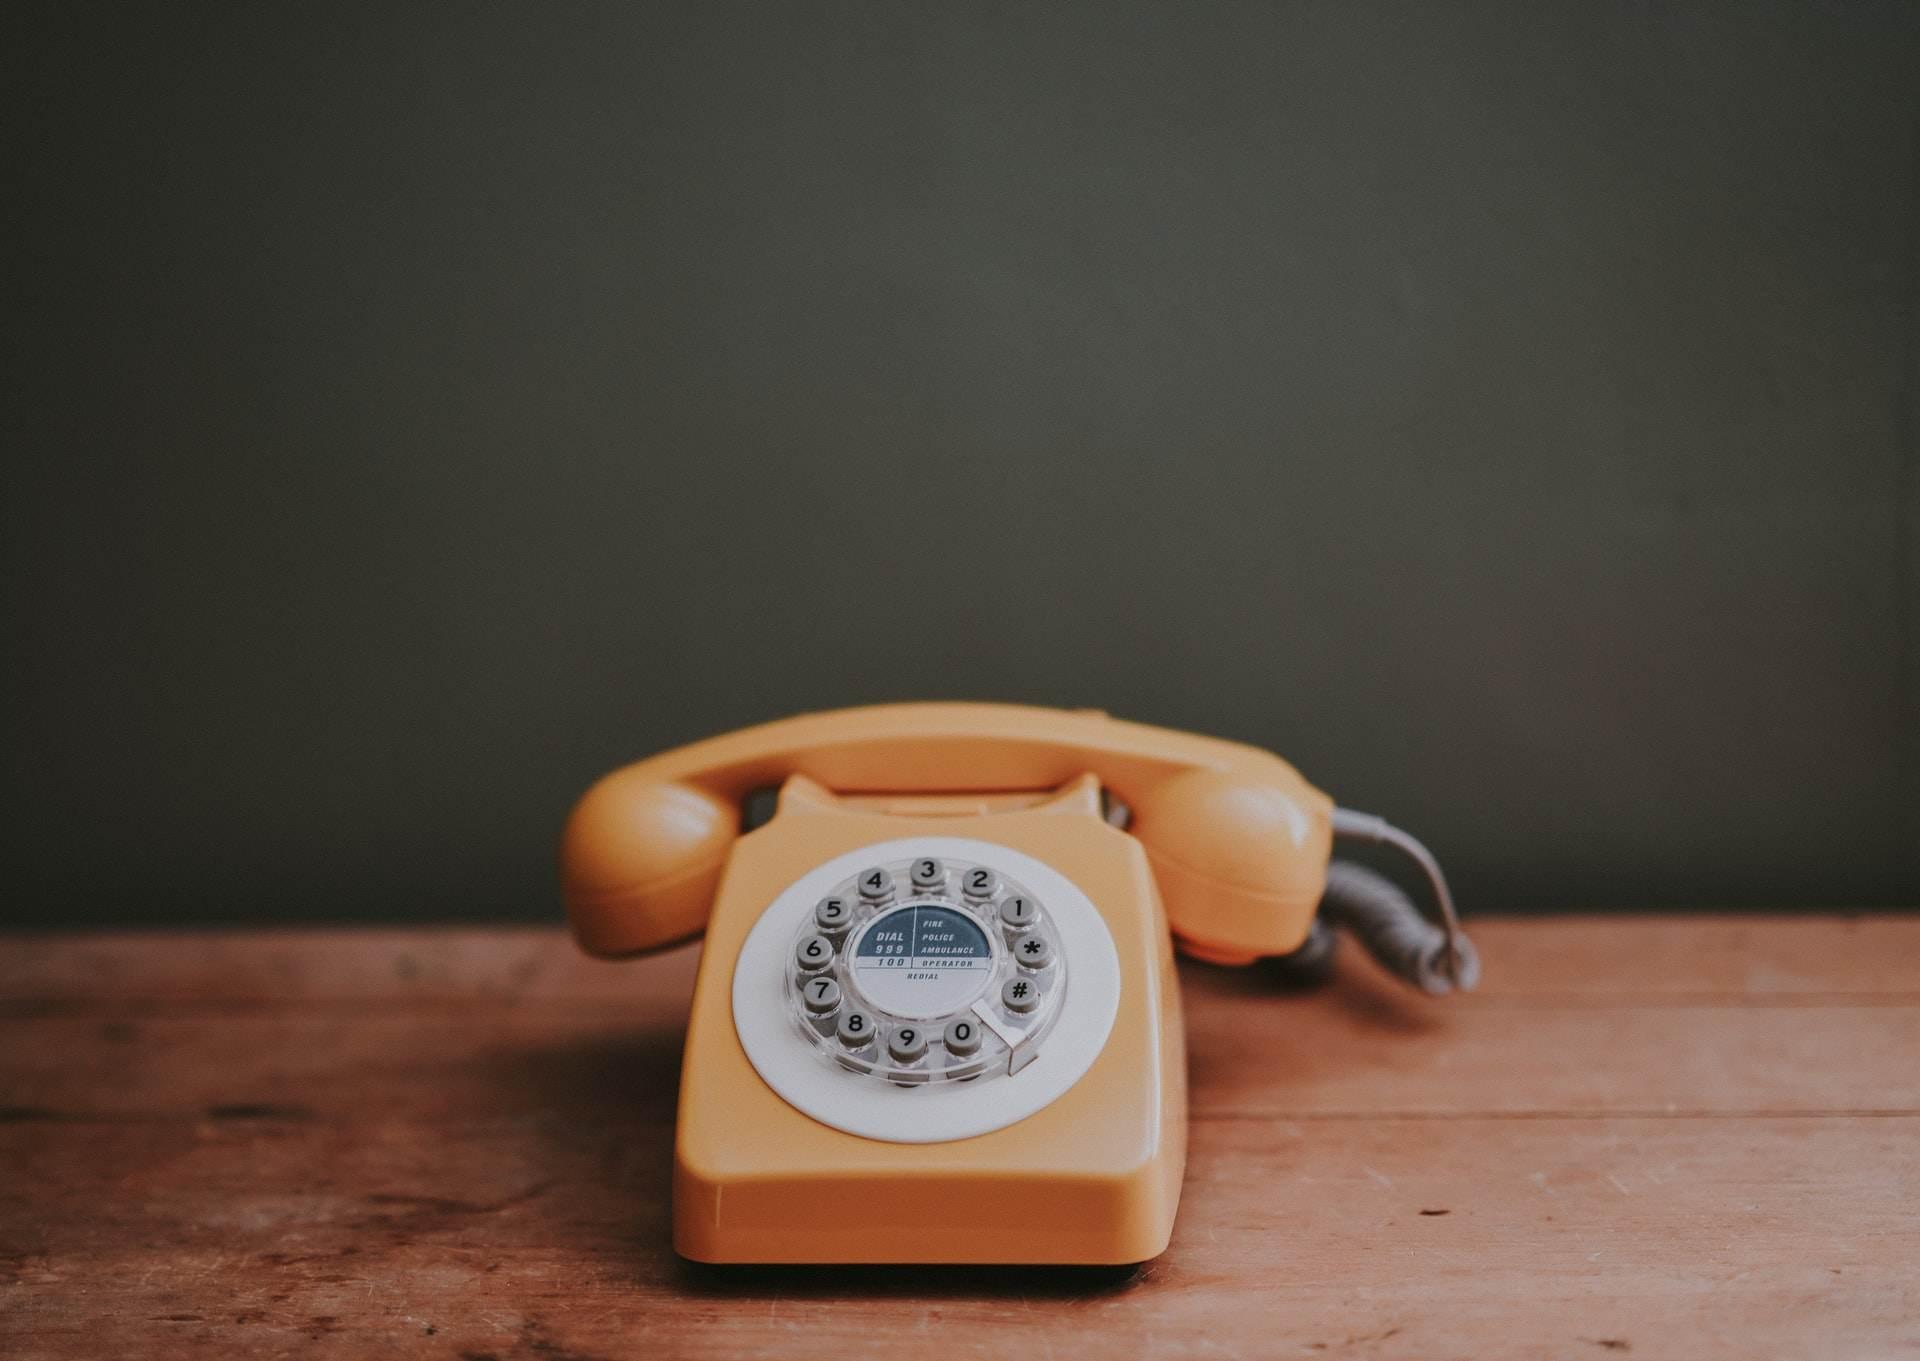 Mengenal Telephobia, Gangguan Ketika Melakukan Panggilan Telepon